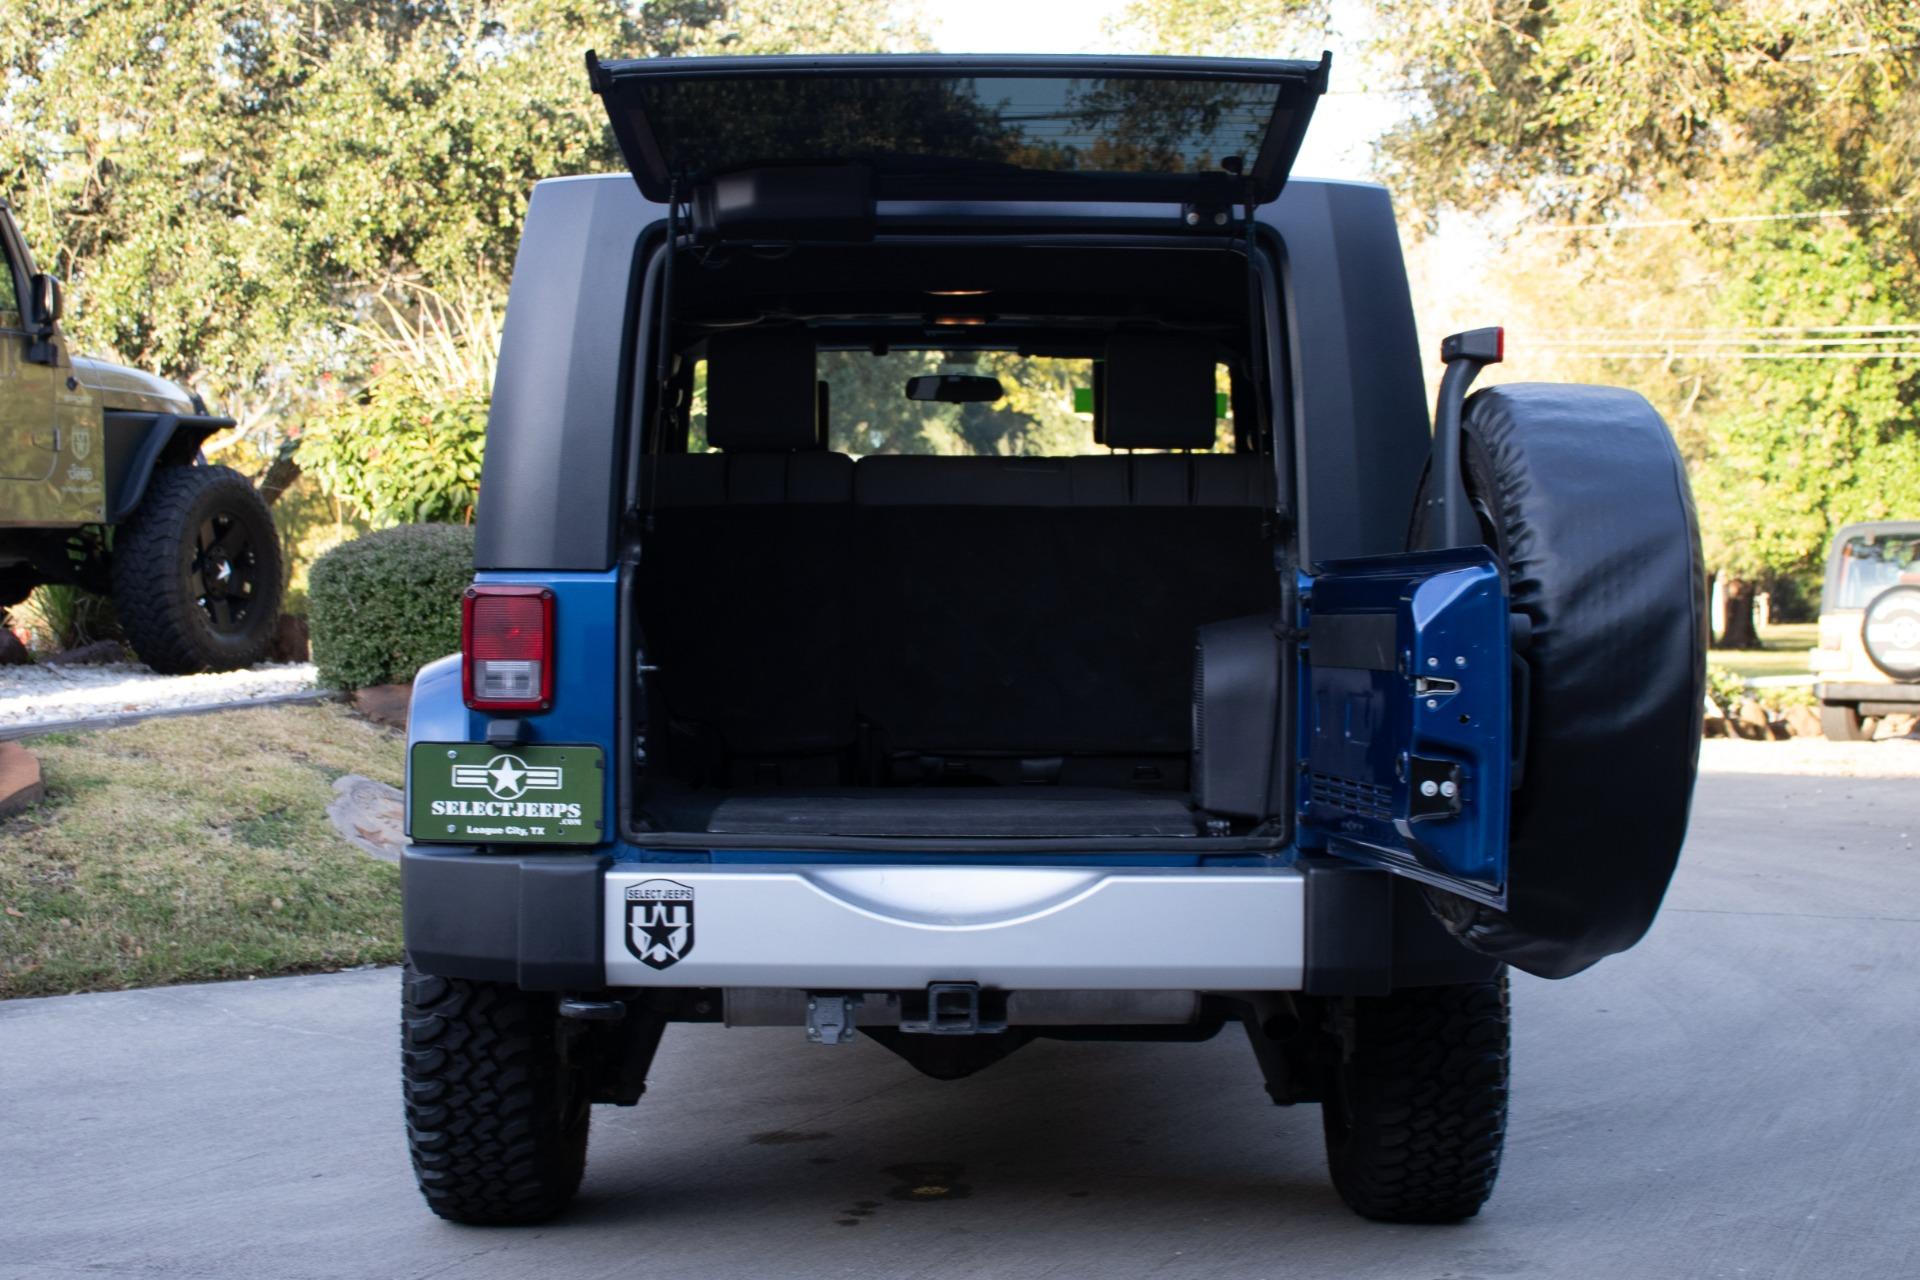 Used-2010-Jeep-Wrangler-Unlimited-Sahara-4WD-4dr-Sahara